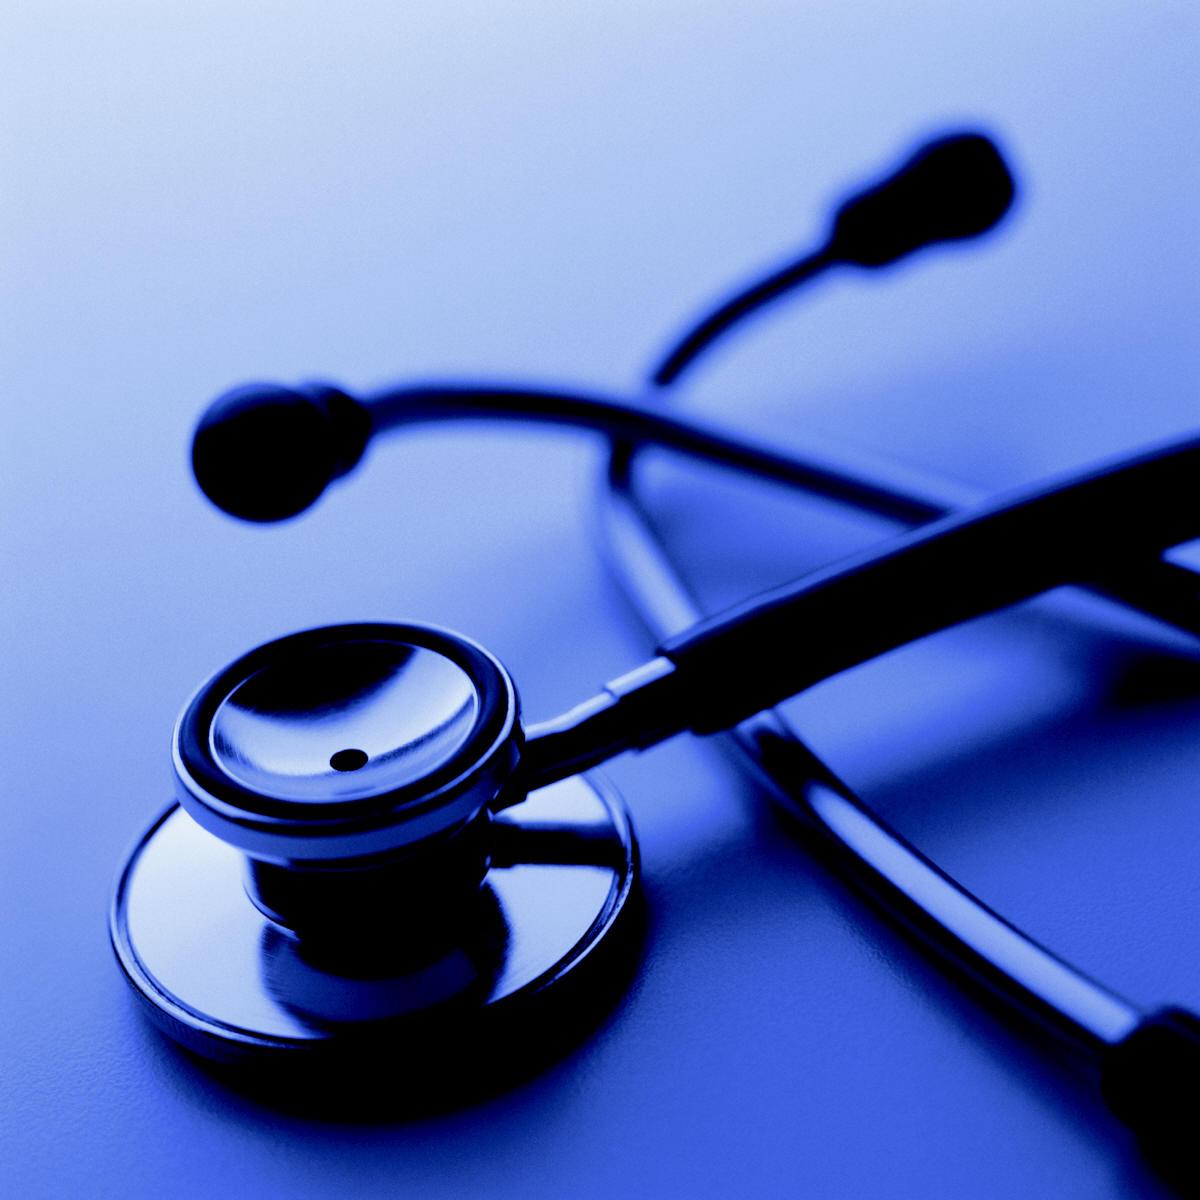 Sistema Sanitario nazionale - Stetoscopio